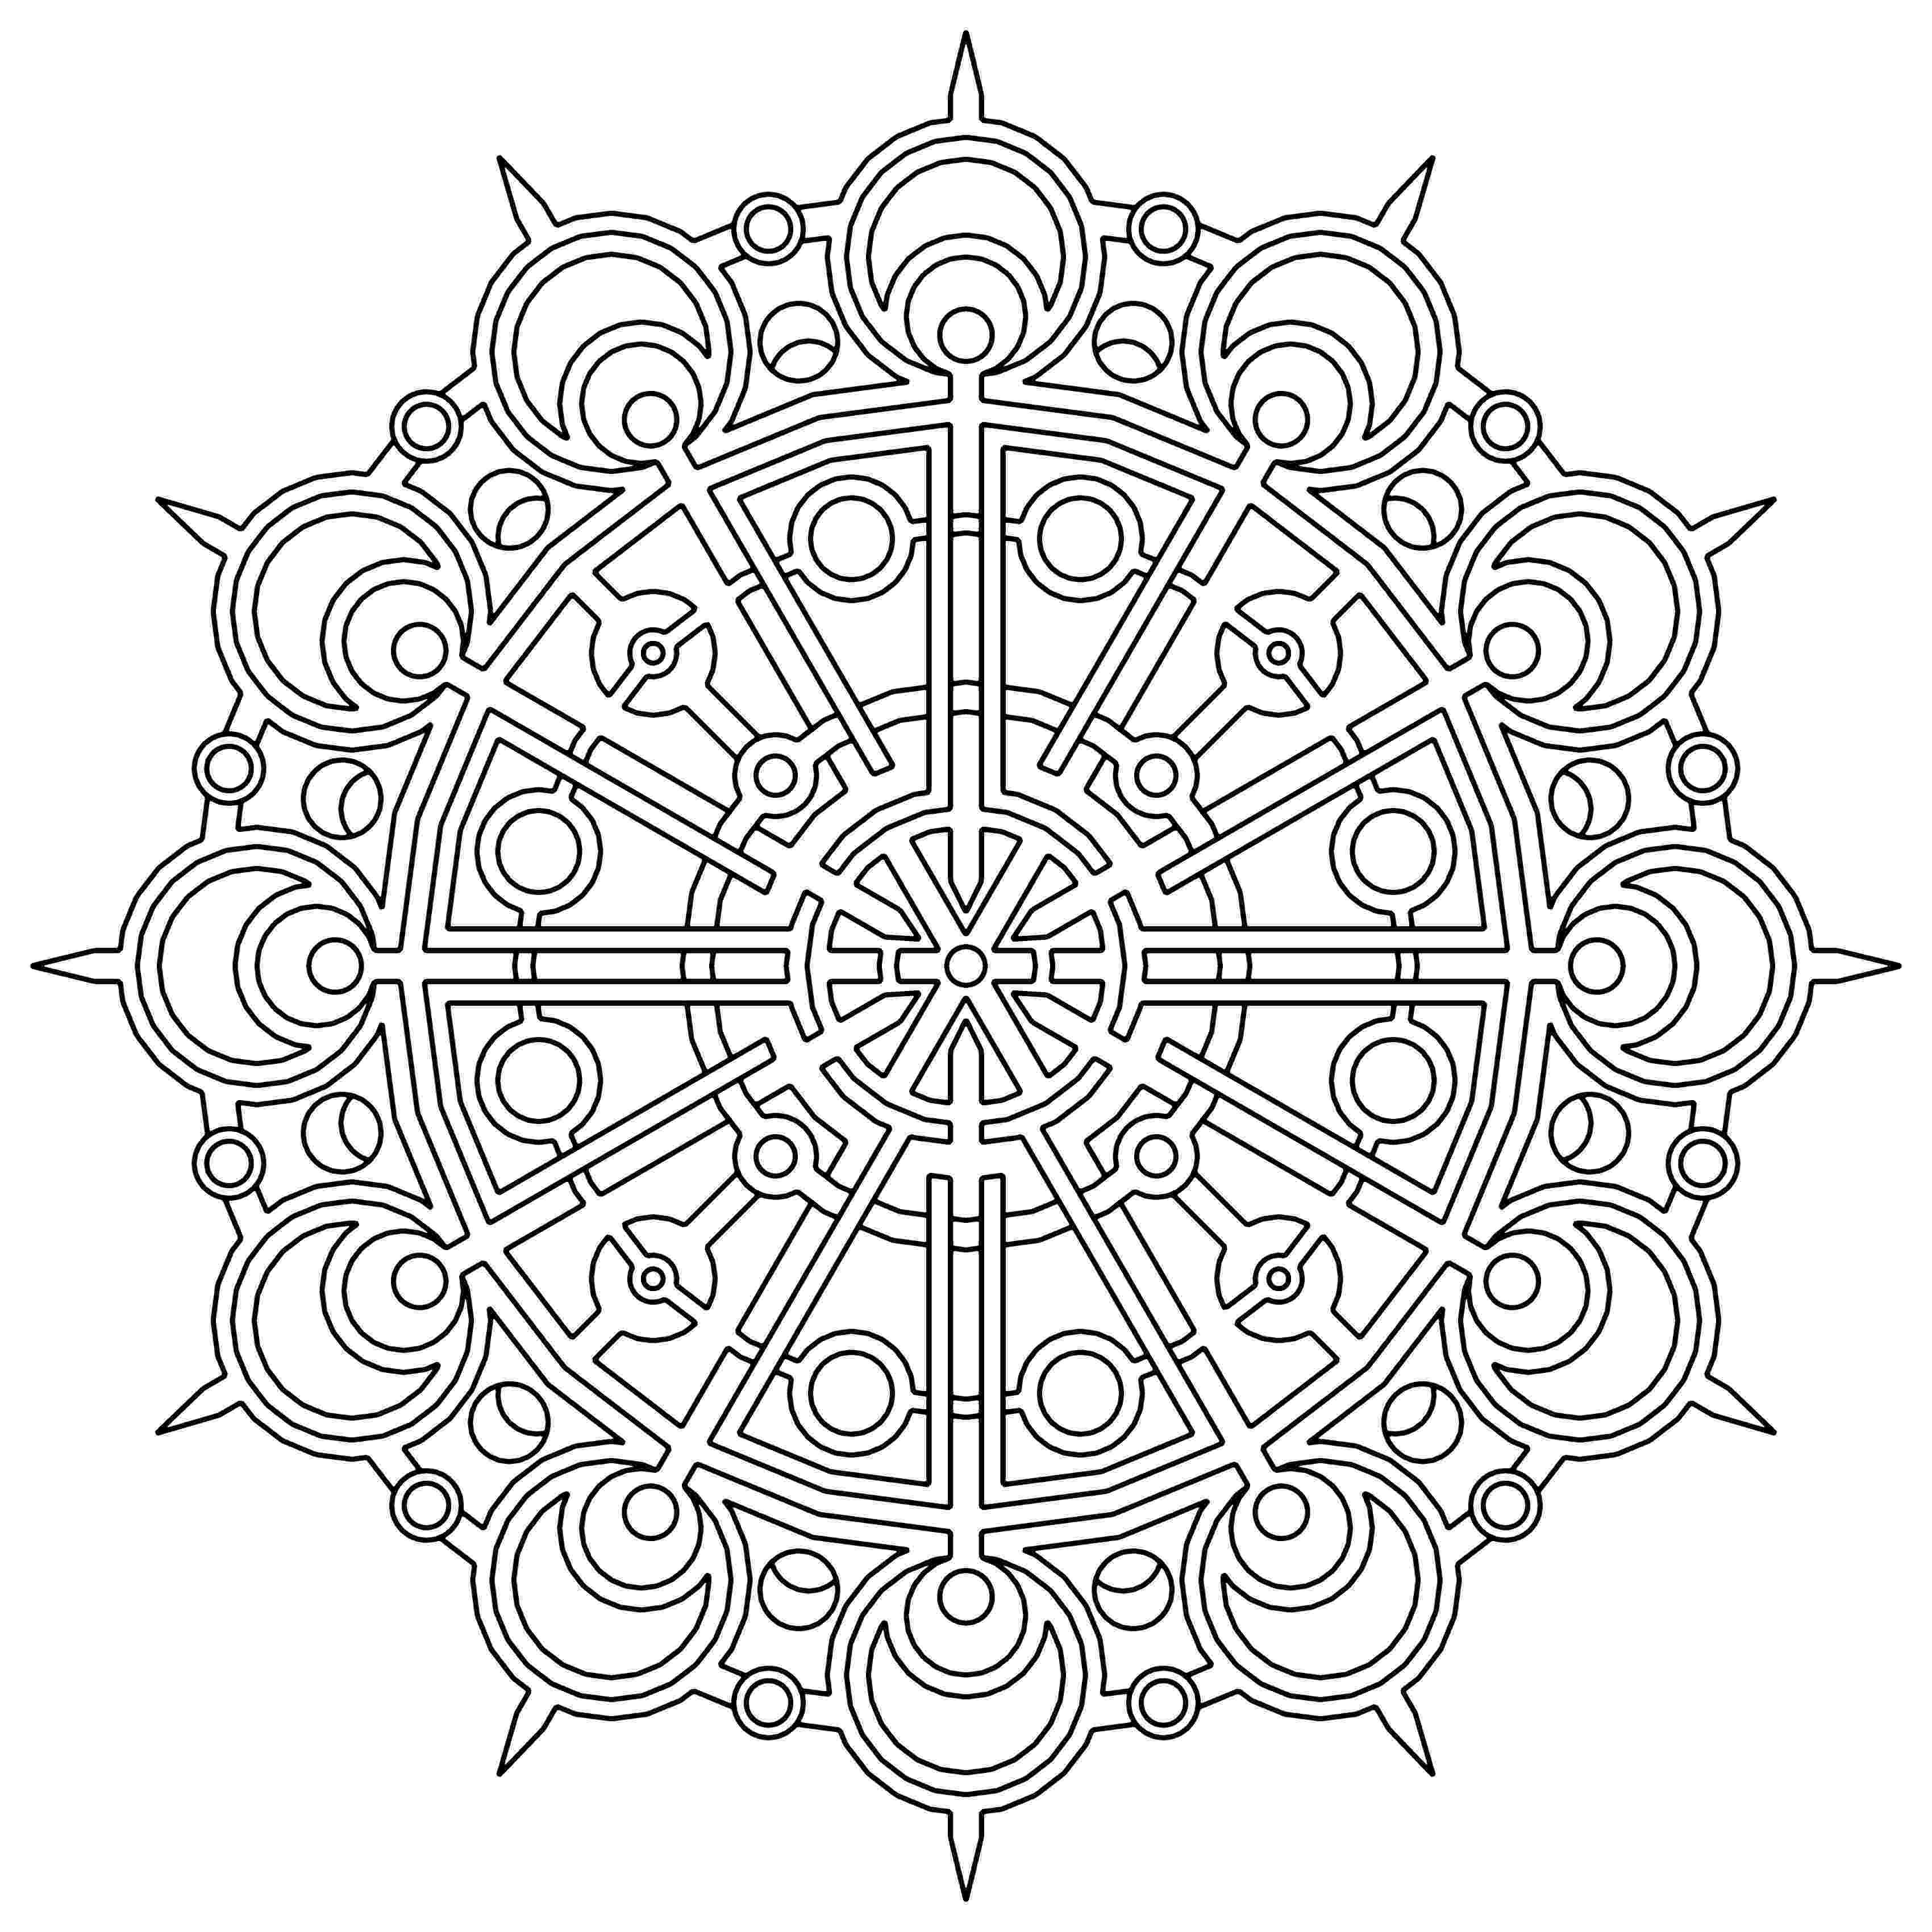 design coloring page free printable geometric coloring pages for kids design coloring page